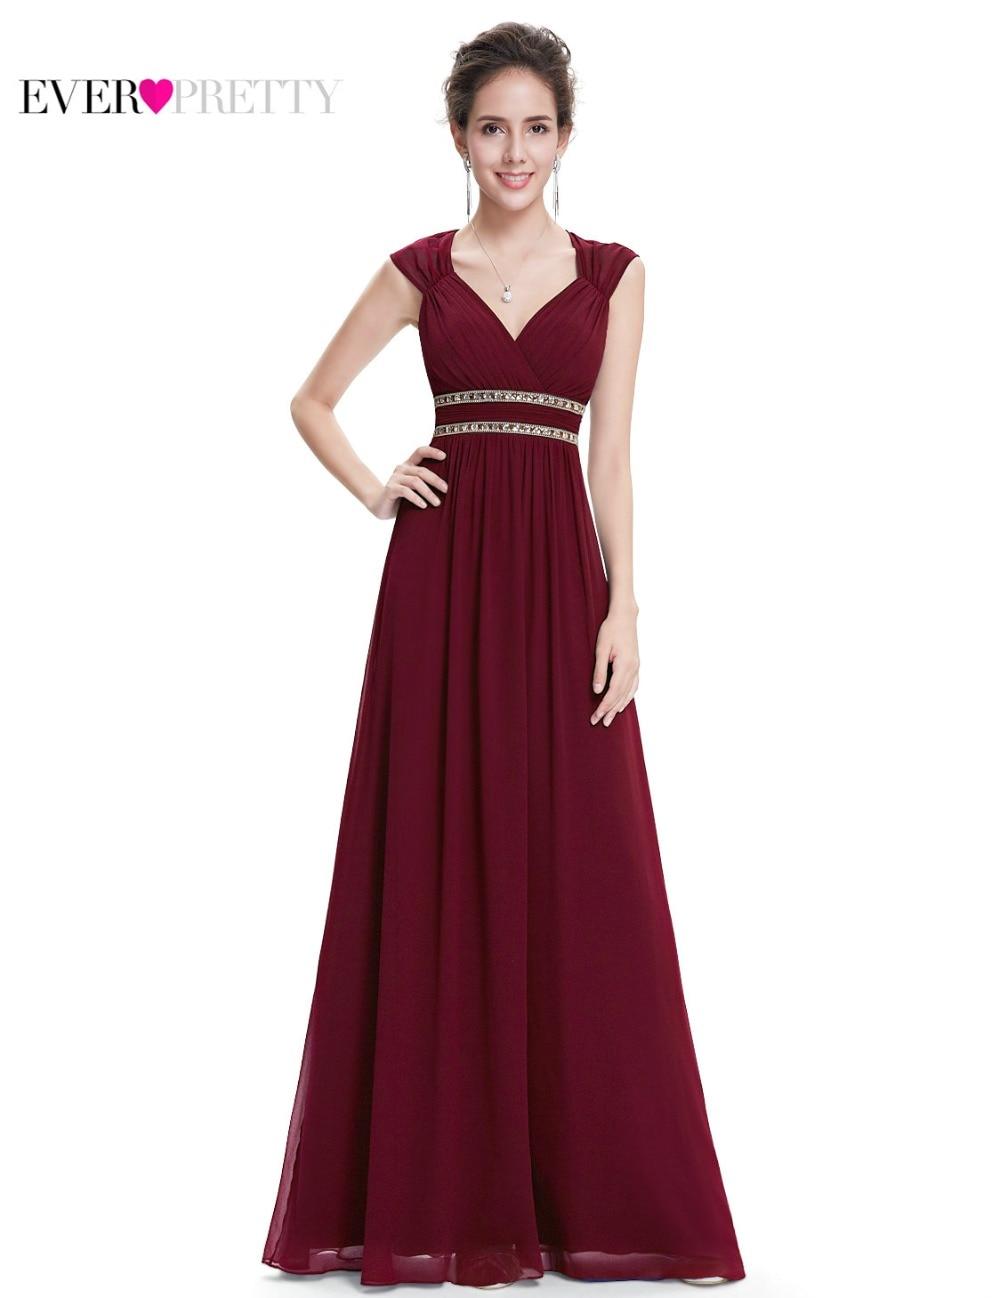 Ever Pretty 2020 Clearance Style Women Elegant Bridesmaid Dresses Long V-Neck Formal Dress Wedding Party Dress XX79680PEA